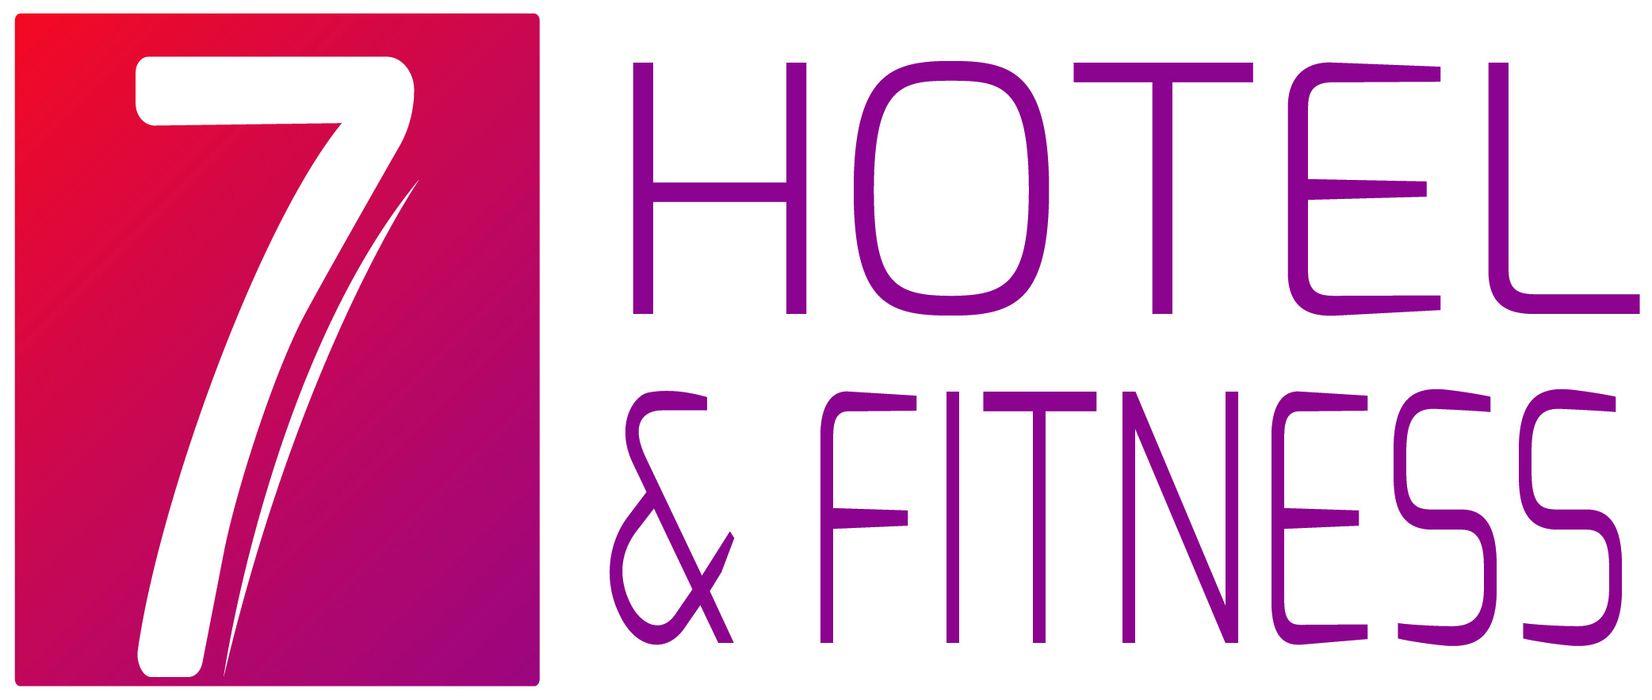 Nuit à l'Hotel : 7 Hotel & Fitness - Chambre double + accès SPA à Strasbourg (67)